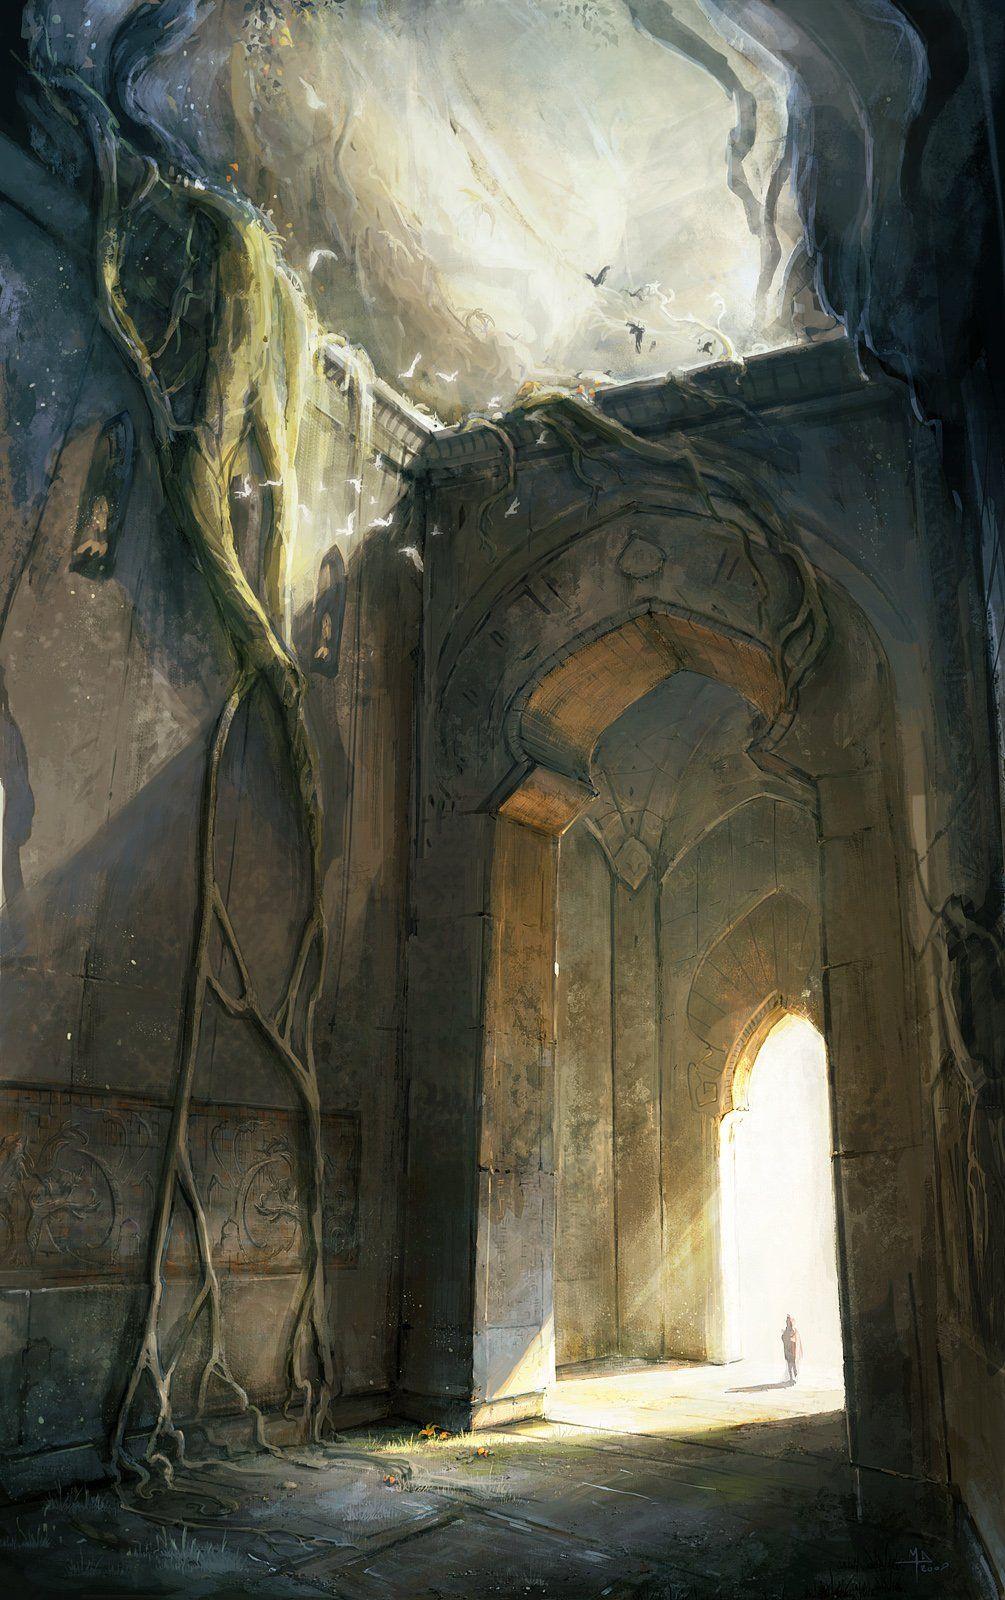 les incroyables artworks de prince of persia | おしゃれな壁紙背景